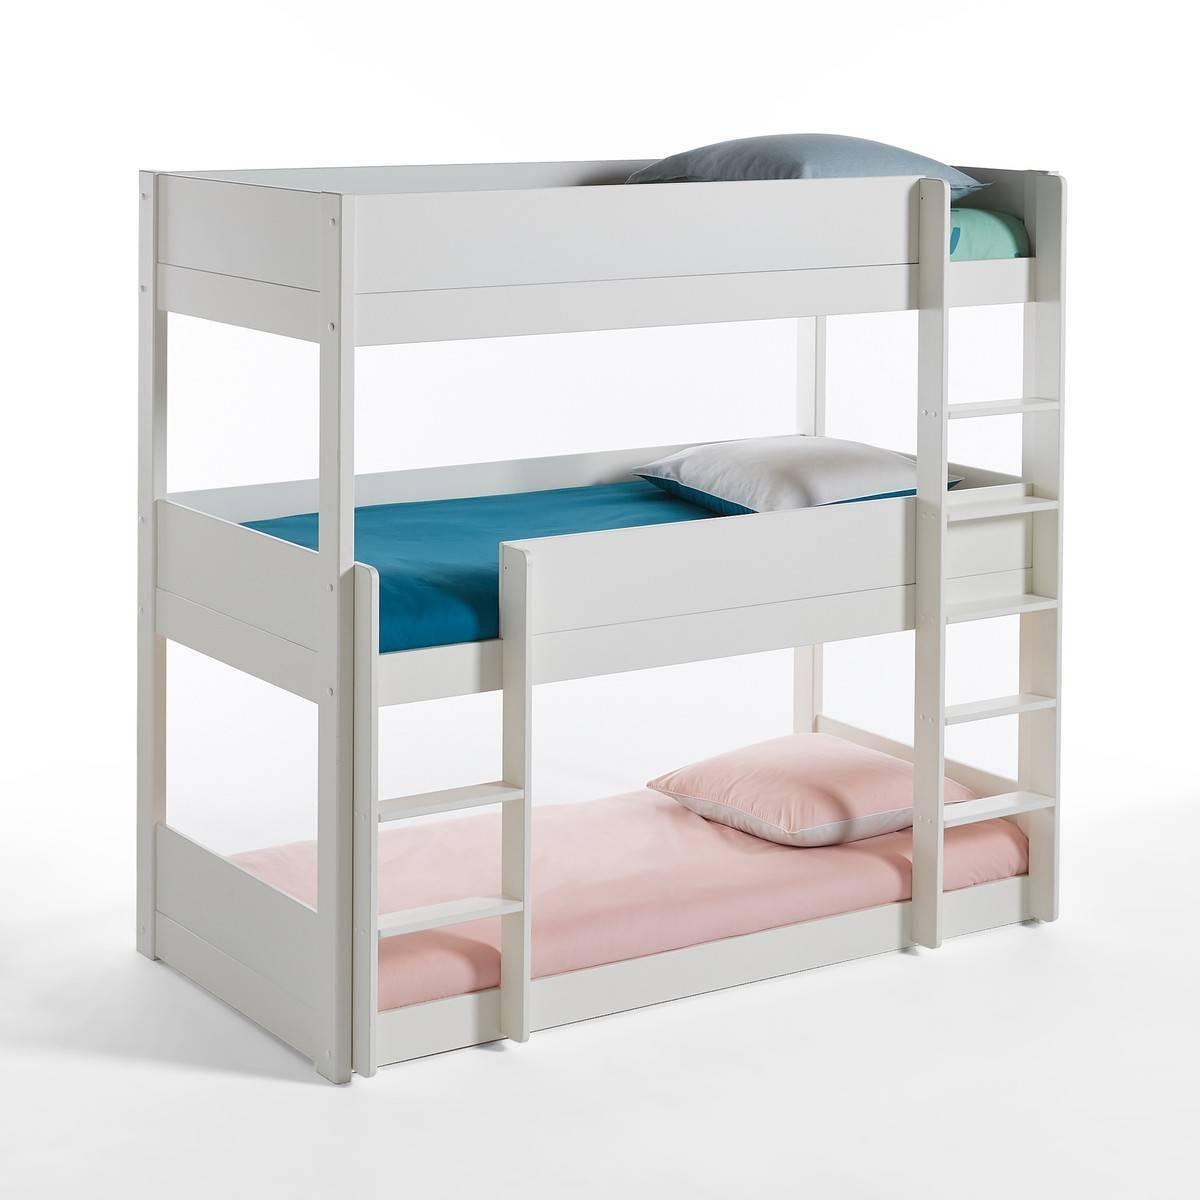 название кровати в три яруса фото бенвенуто известный флорентийский